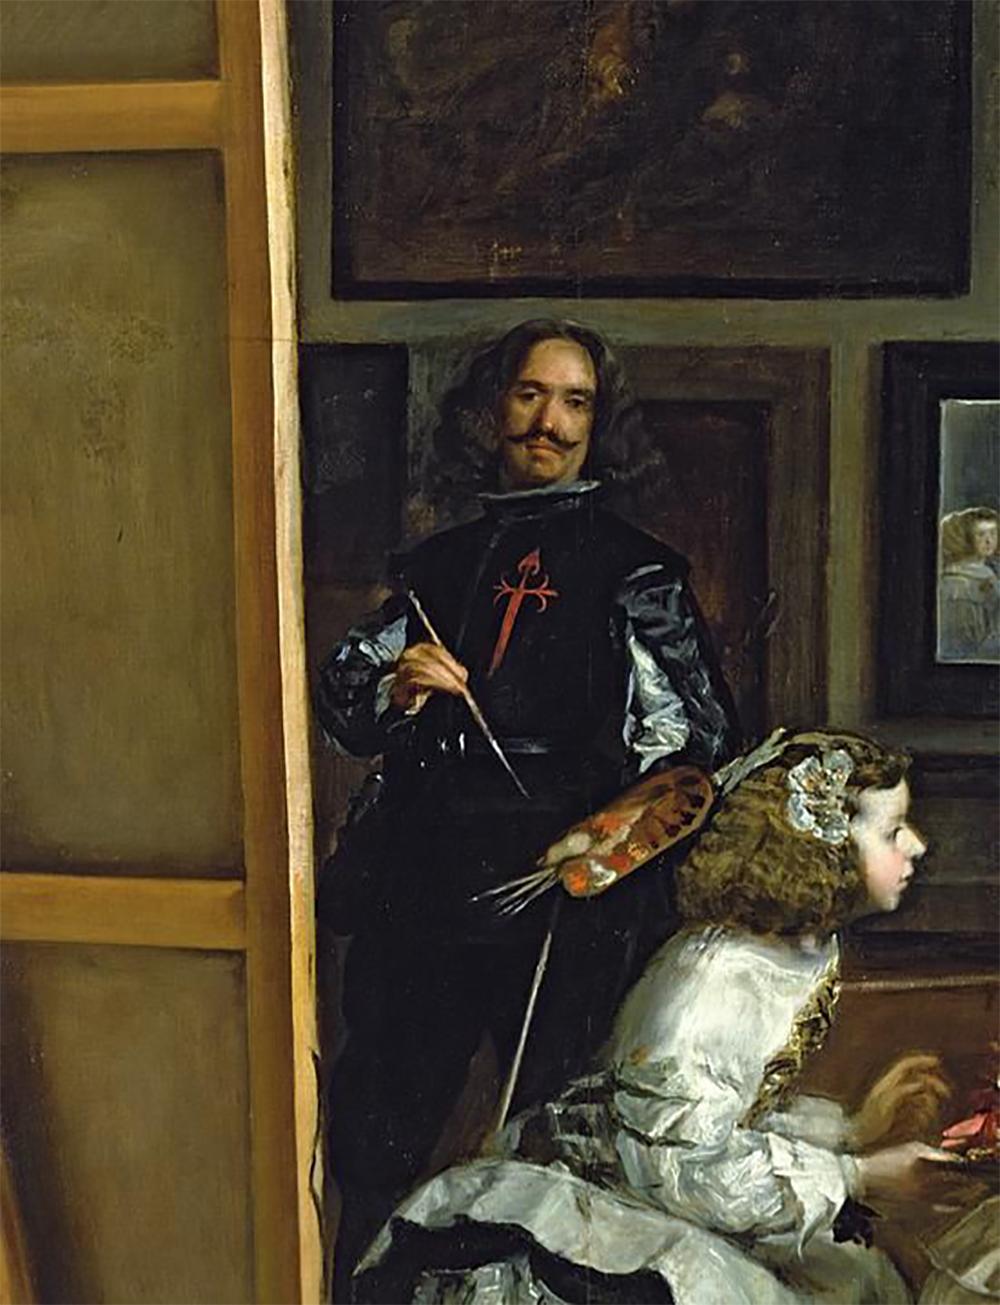 Cote Artiste Peintre Francais artiste peintre — wikipédia